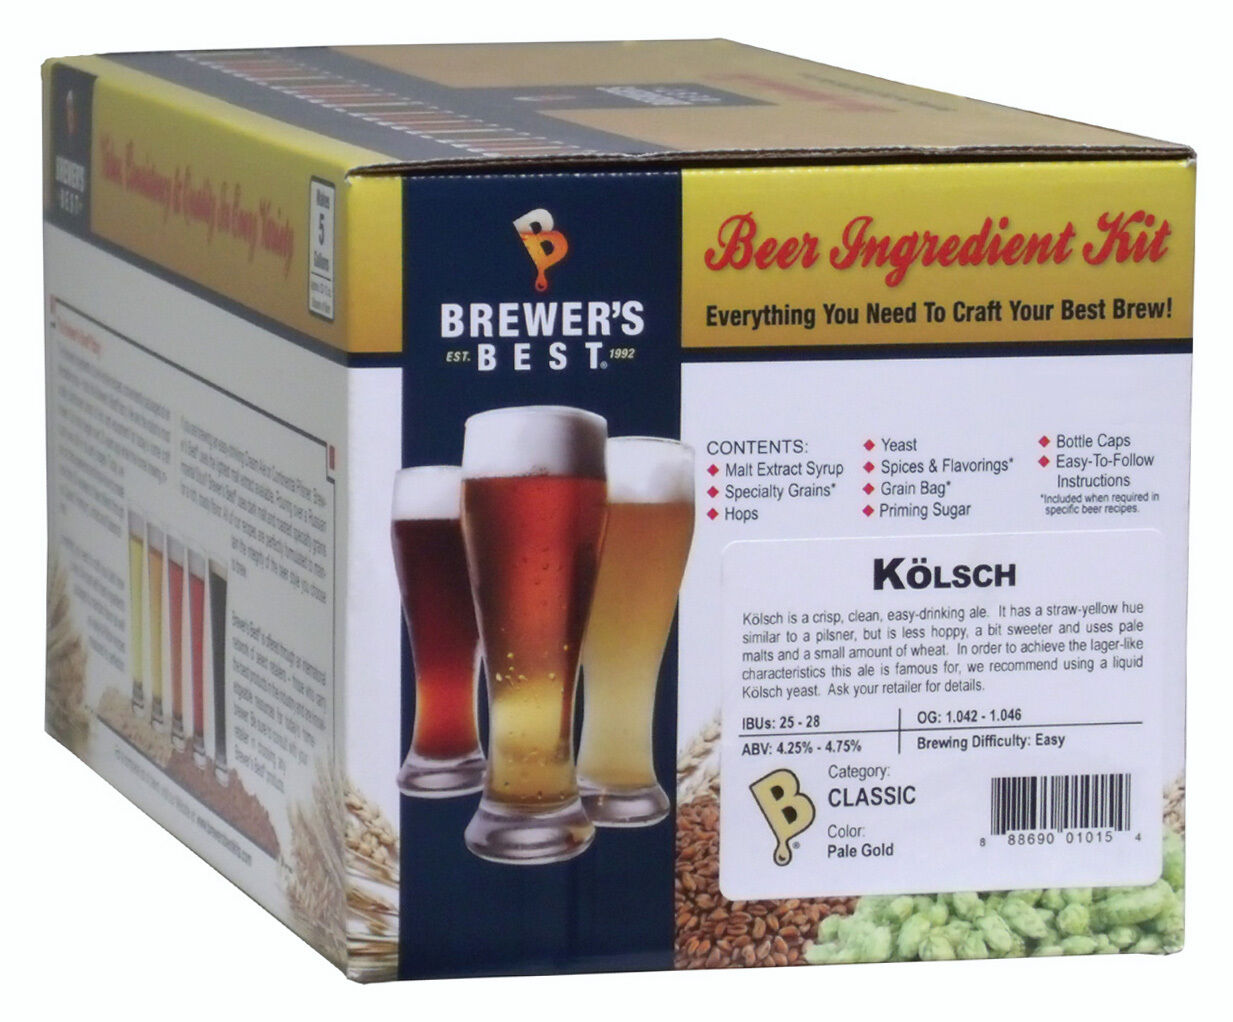 $29.95 - Brewer's Best 5 Gallon Beer Making Ingredient Kit - Kolsch